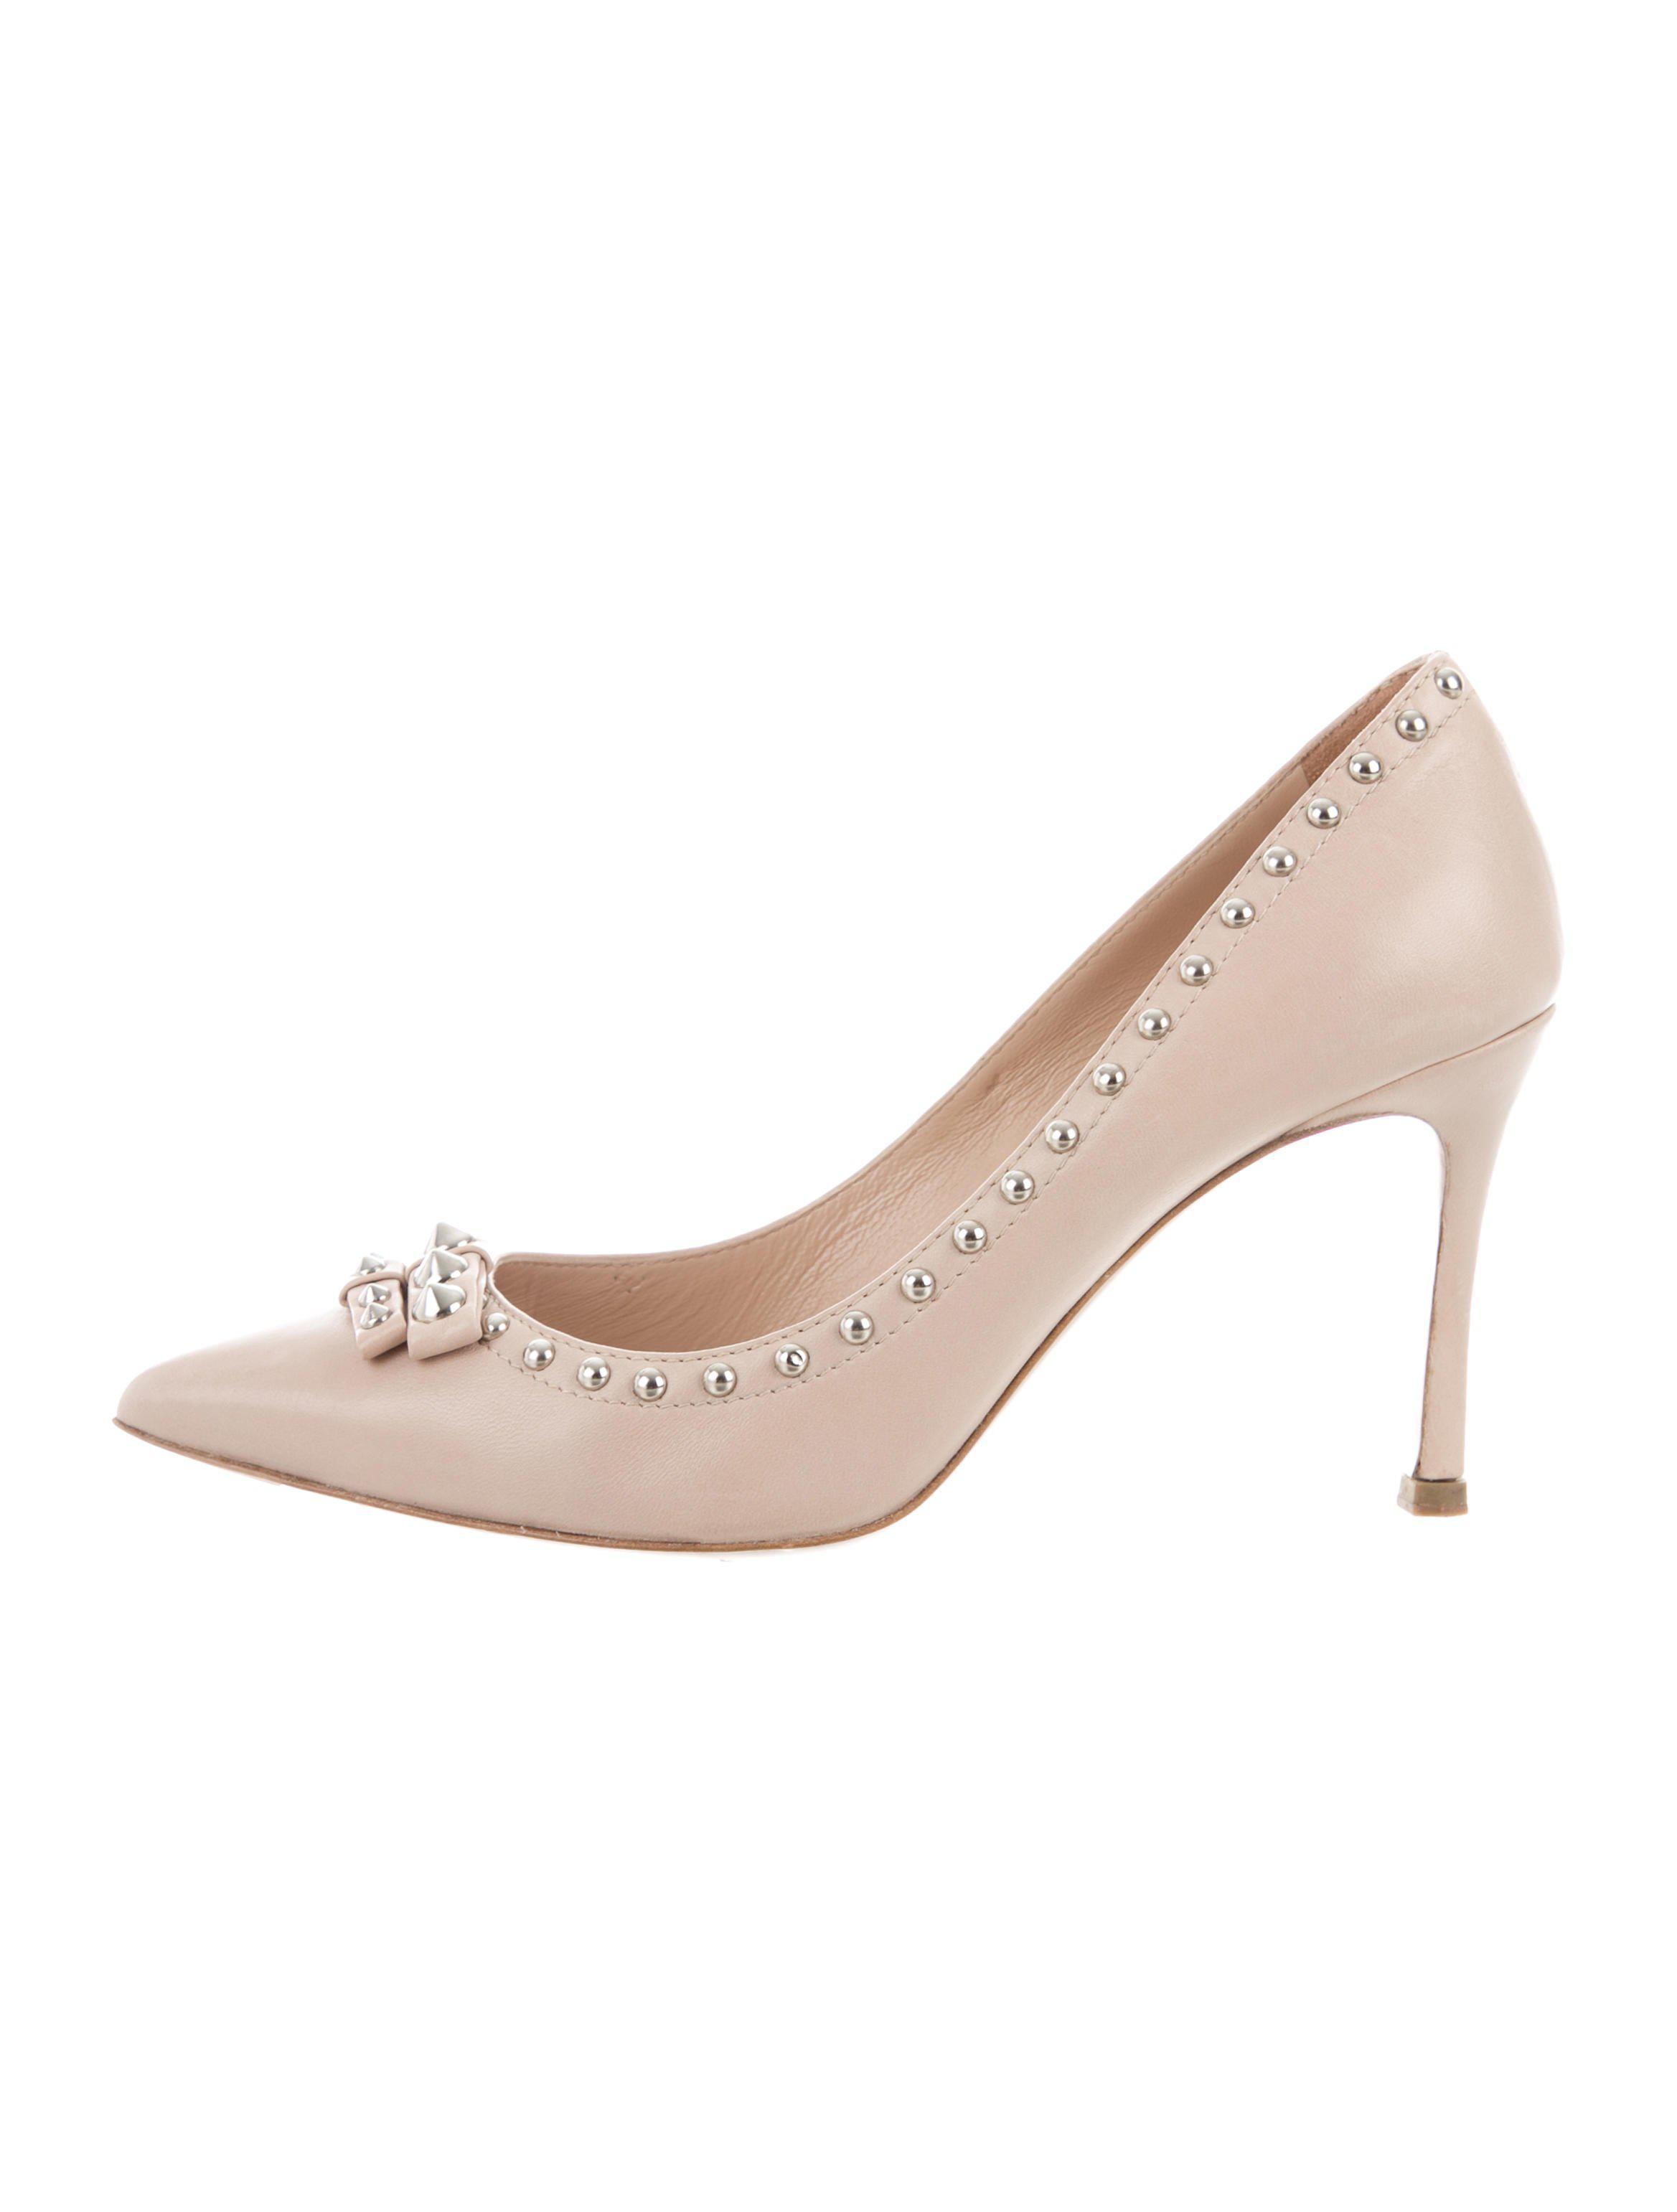 studded heel pumps - Metallic Miu Miu kbc3OHR